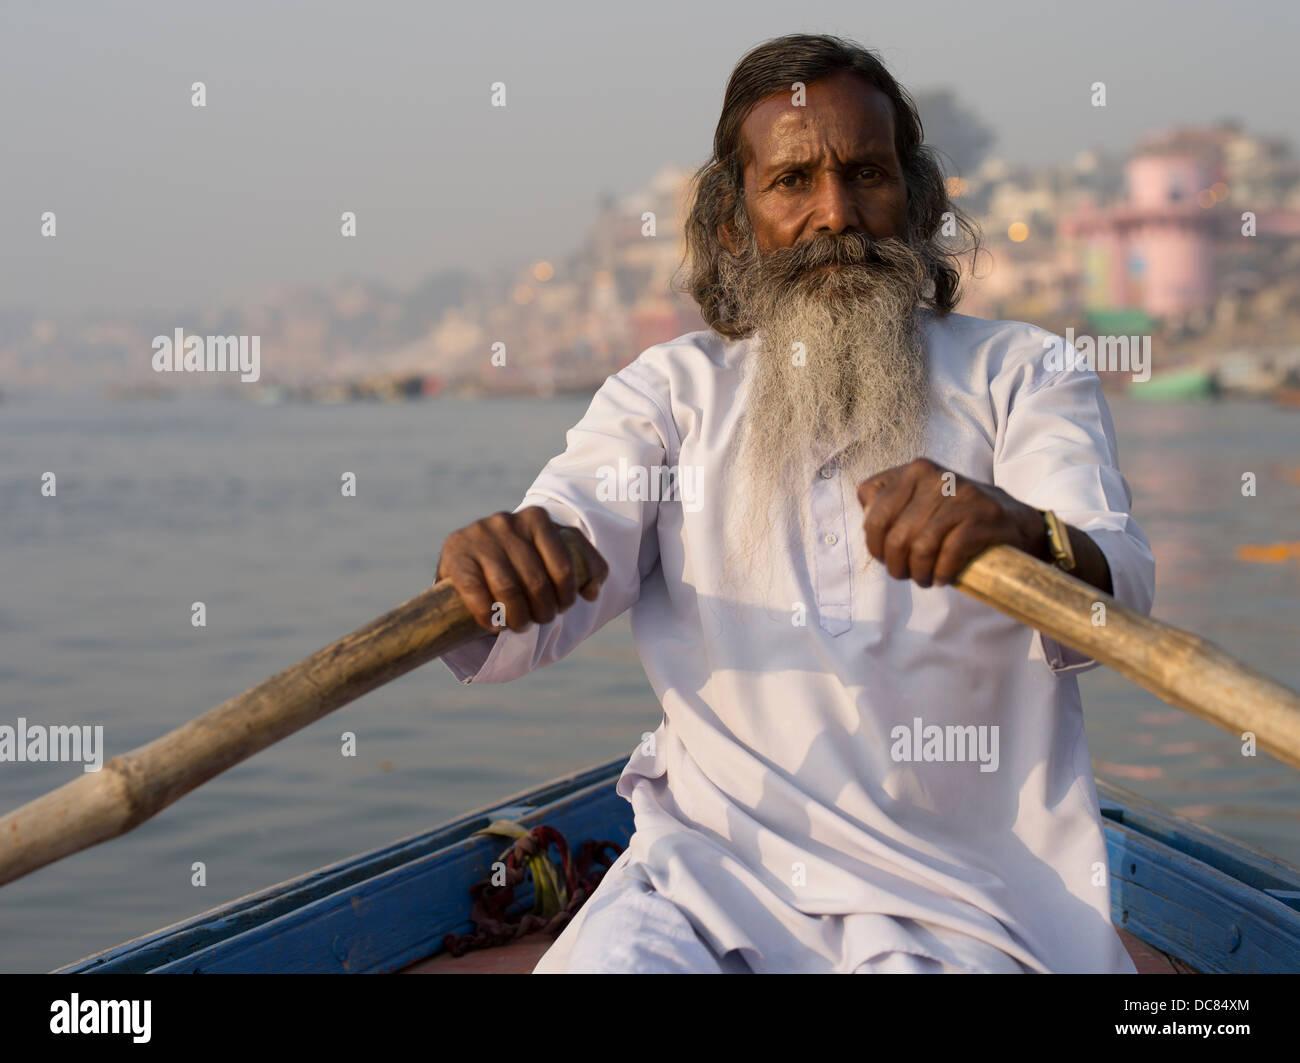 Sadhu Uomo Santo sulle rive del Gange Fiume - Varanasi, India Immagini Stock